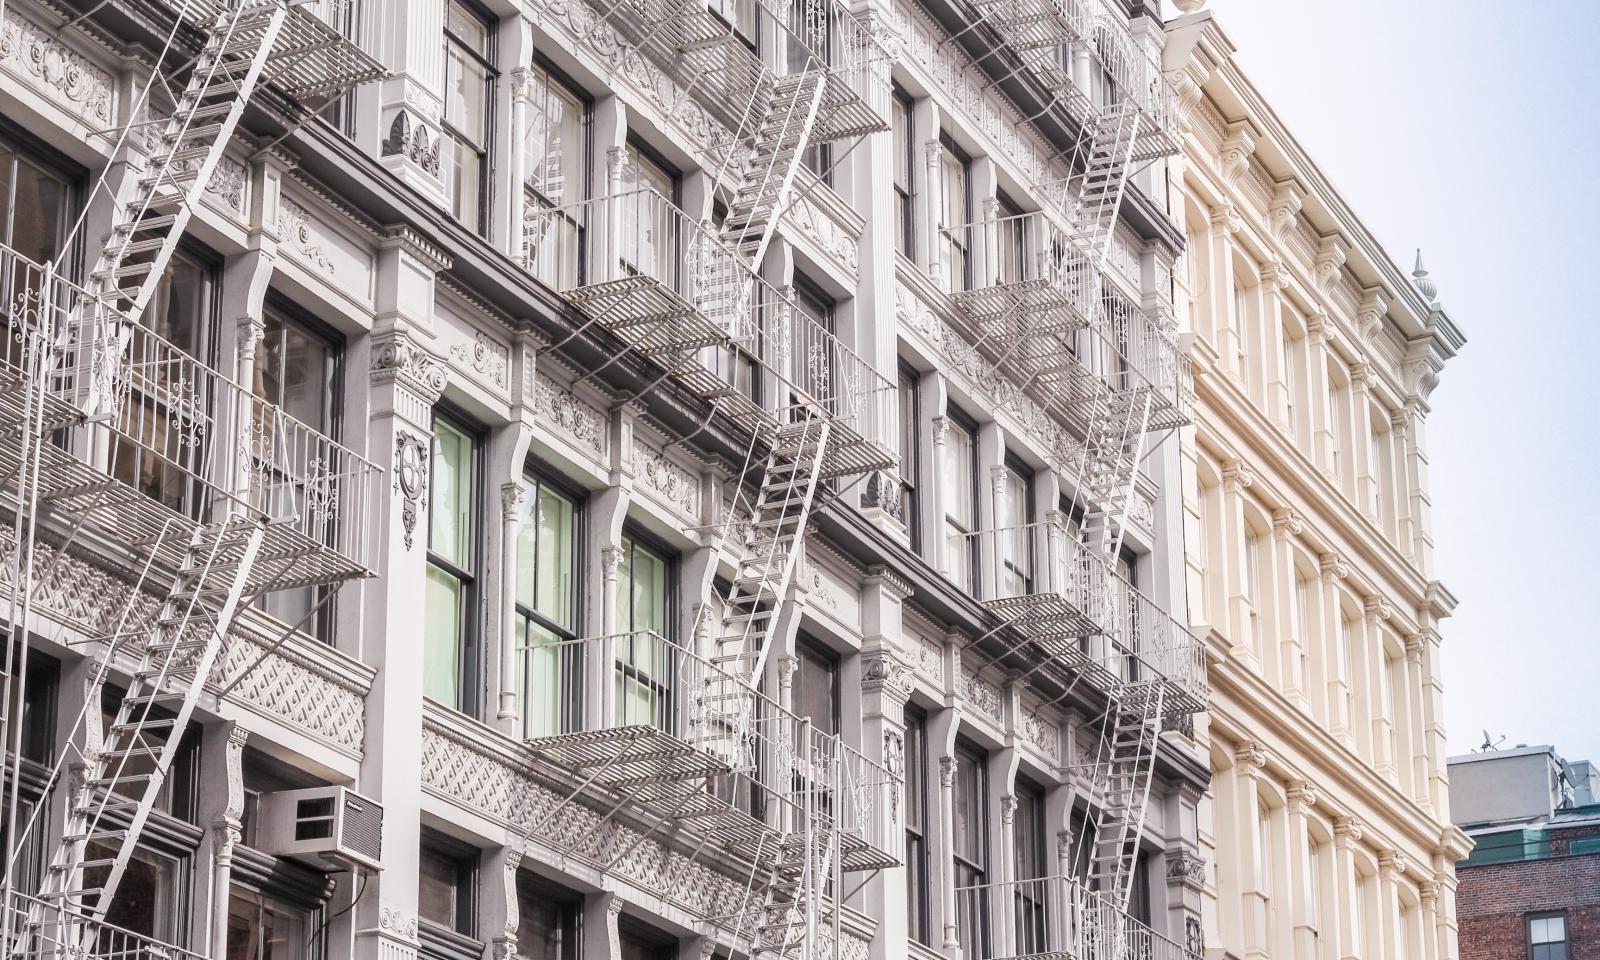 Soho-NYC-cast-iron-district-161031100517011-1600x960.jpg